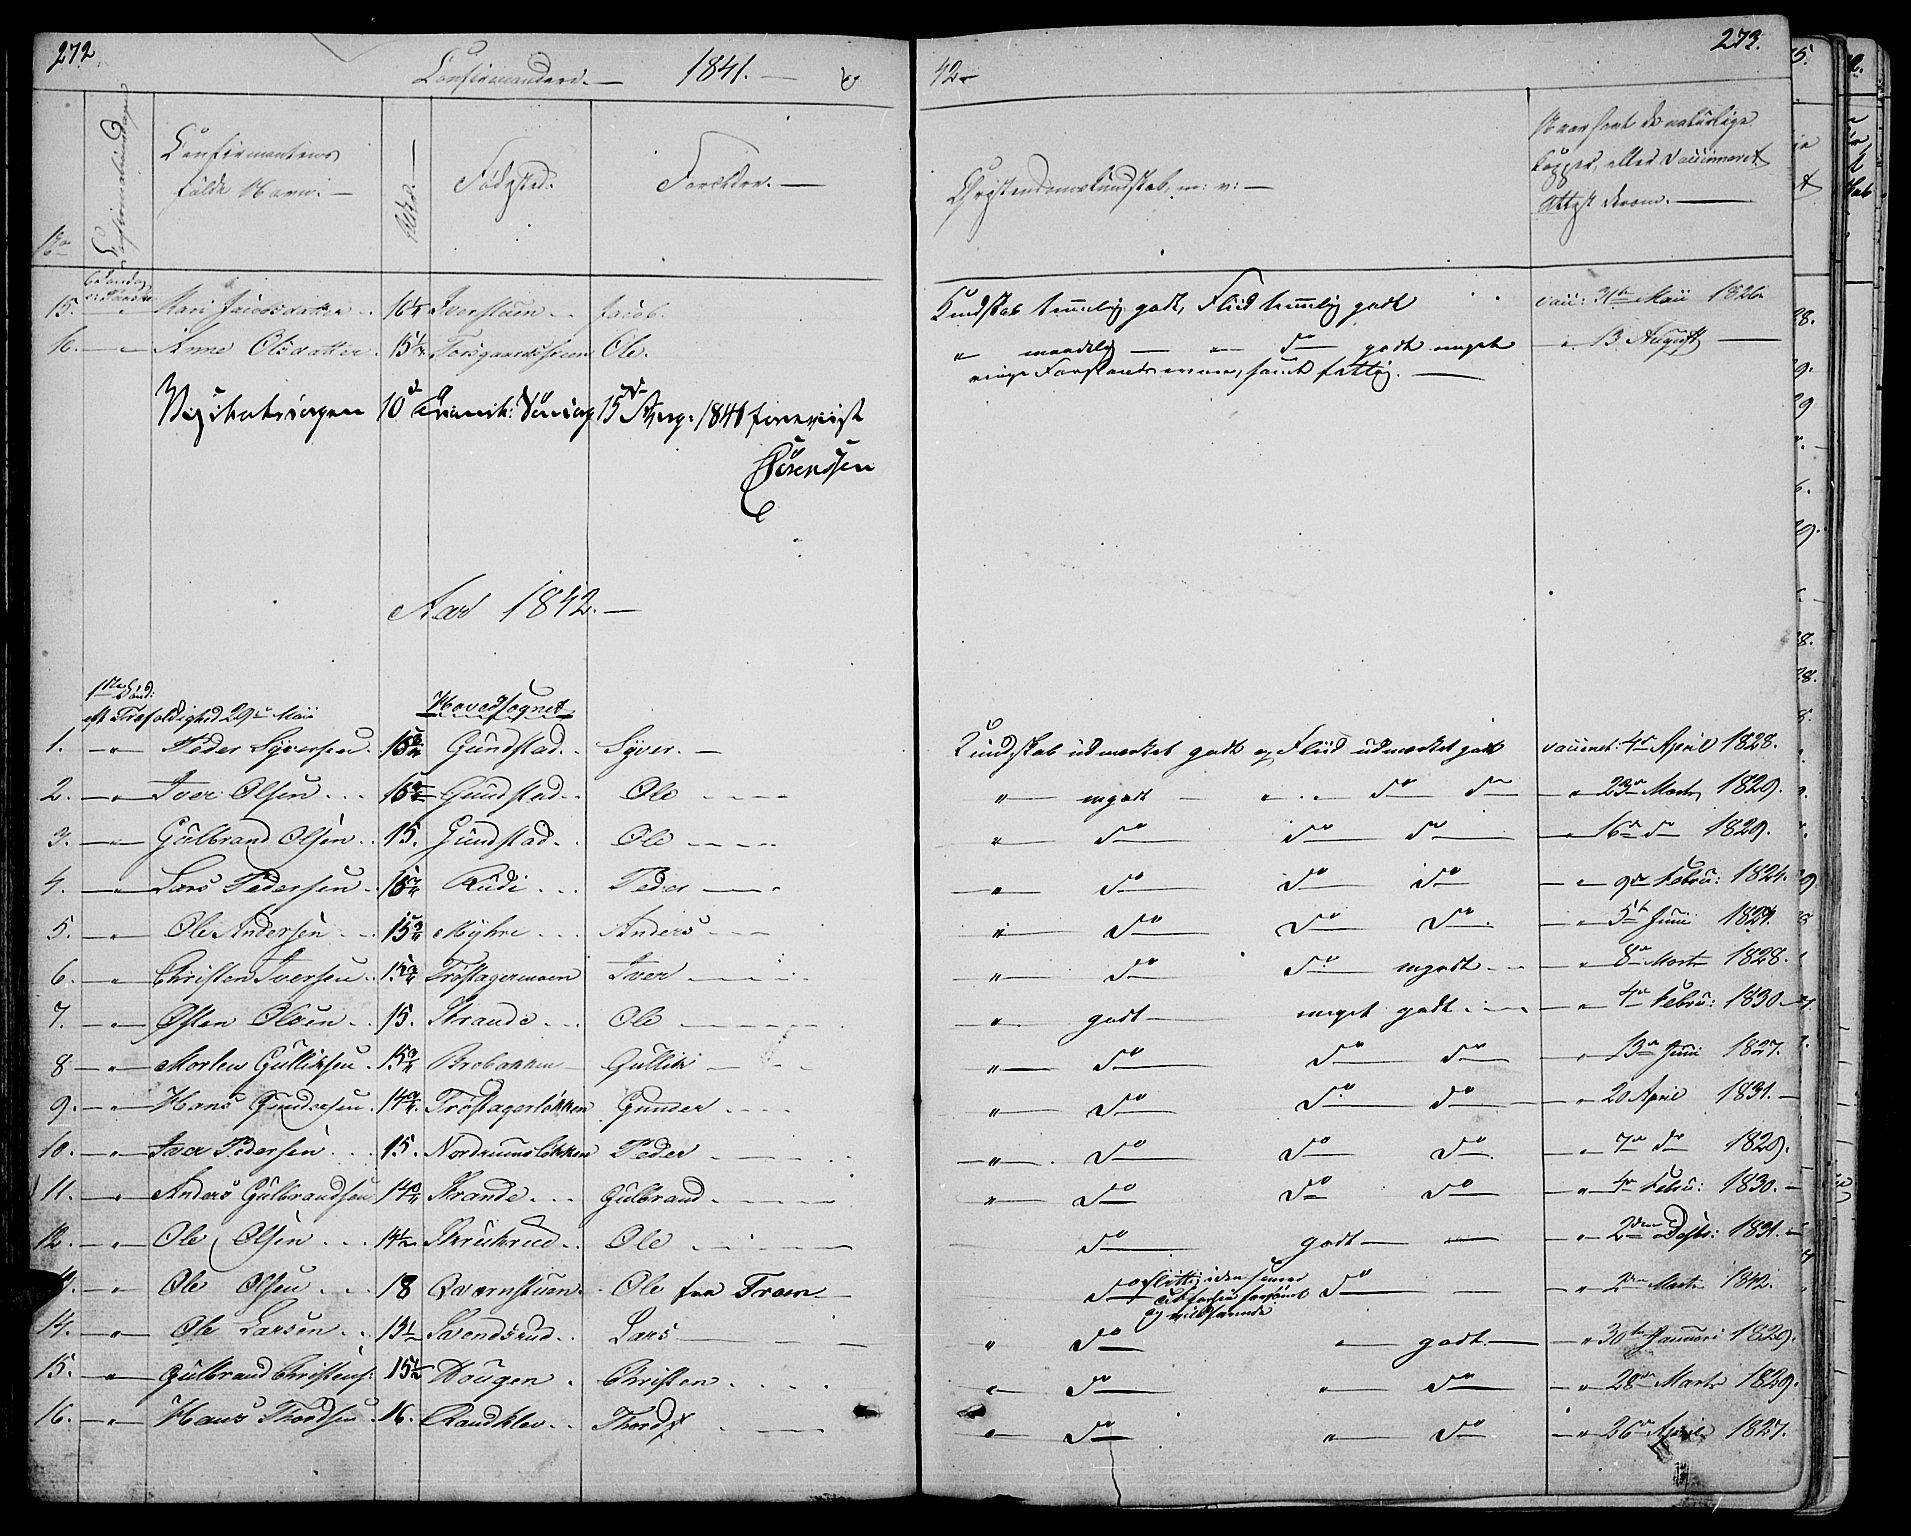 SAH, Ringebu prestekontor, Klokkerbok nr. 2, 1839-1853, s. 272-273